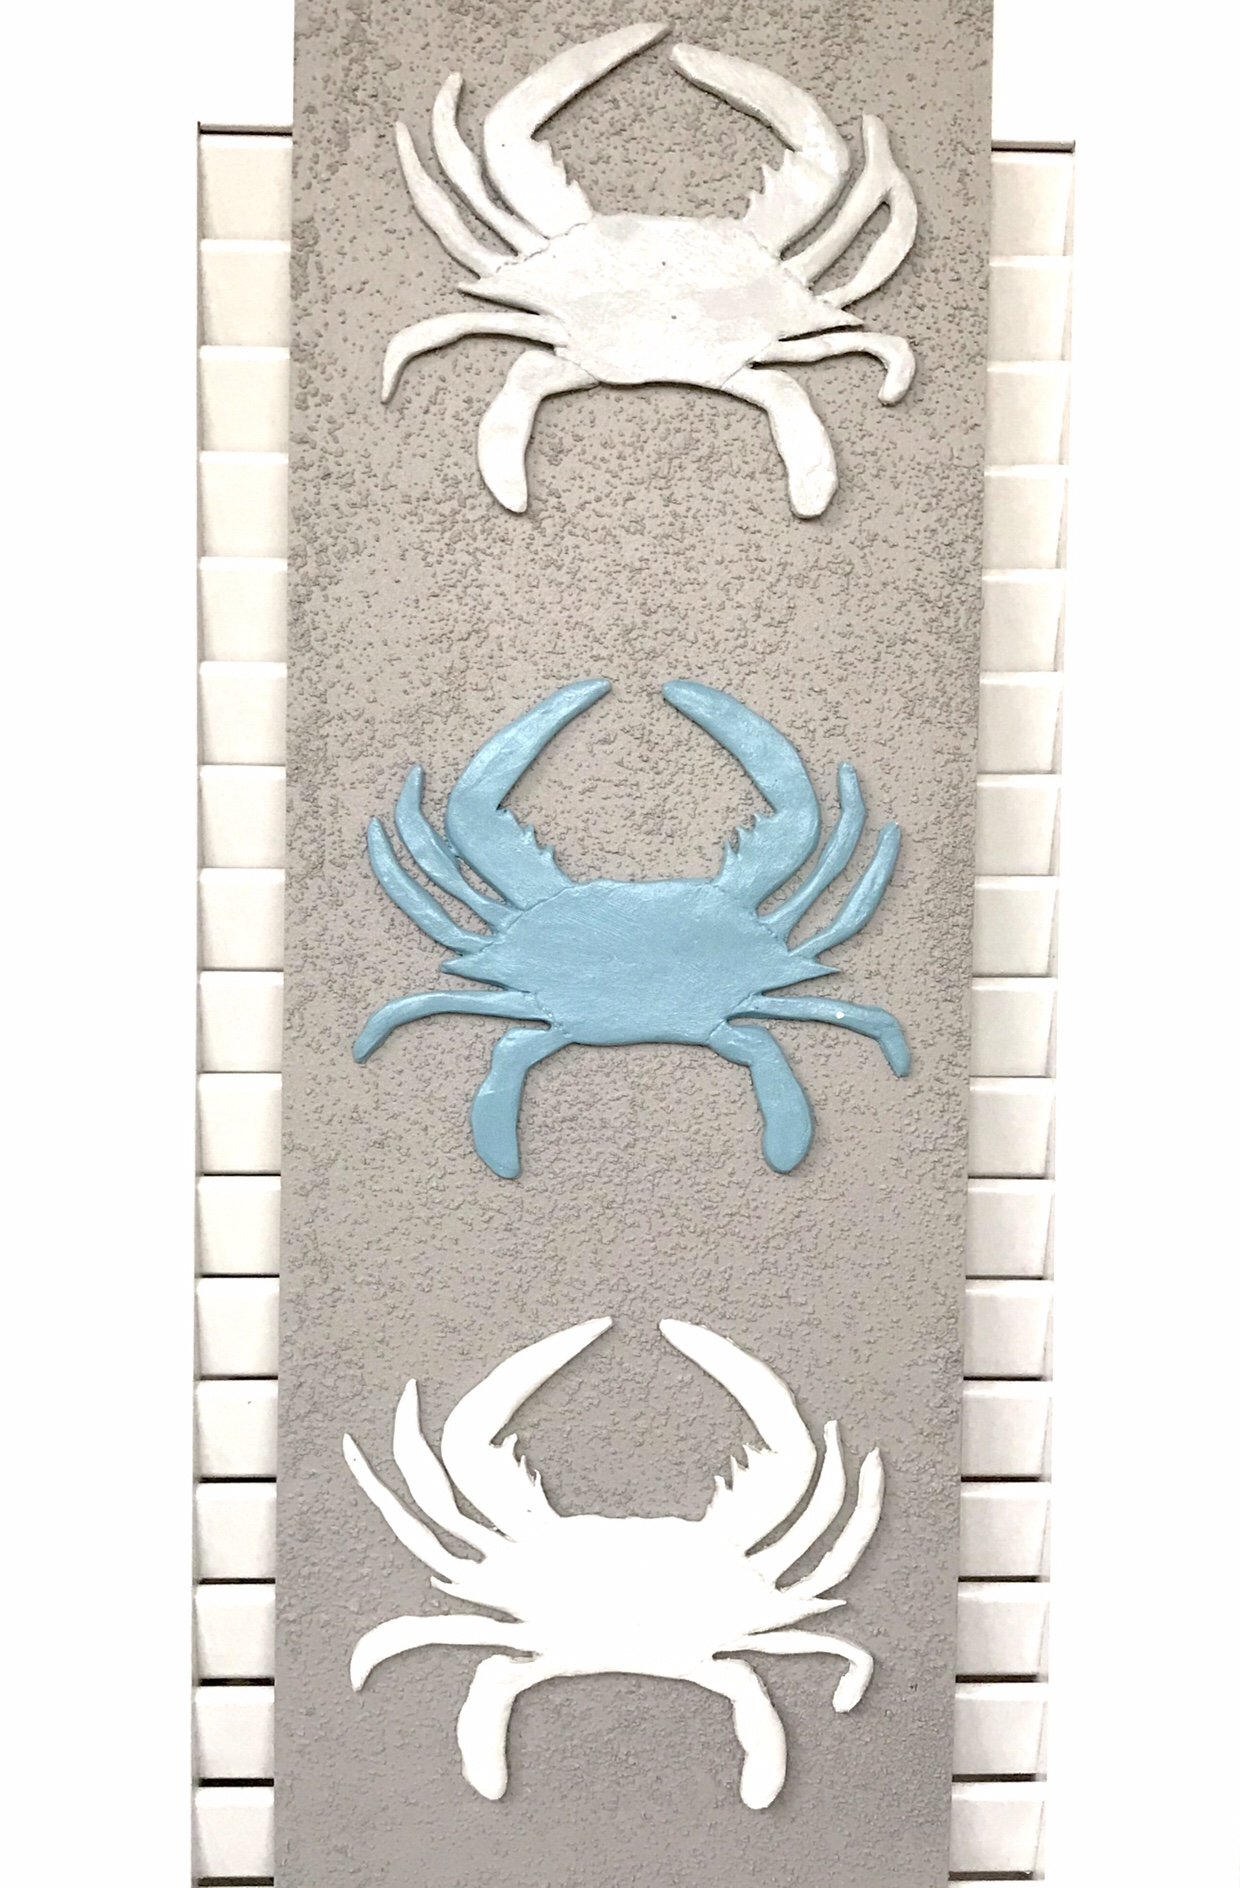 Krabben aus Modelliermasse; Maritime Deko aus lufttrocknemdem Ton basteln, Sommerdeko selber machen; #Chalet8, #Krabben